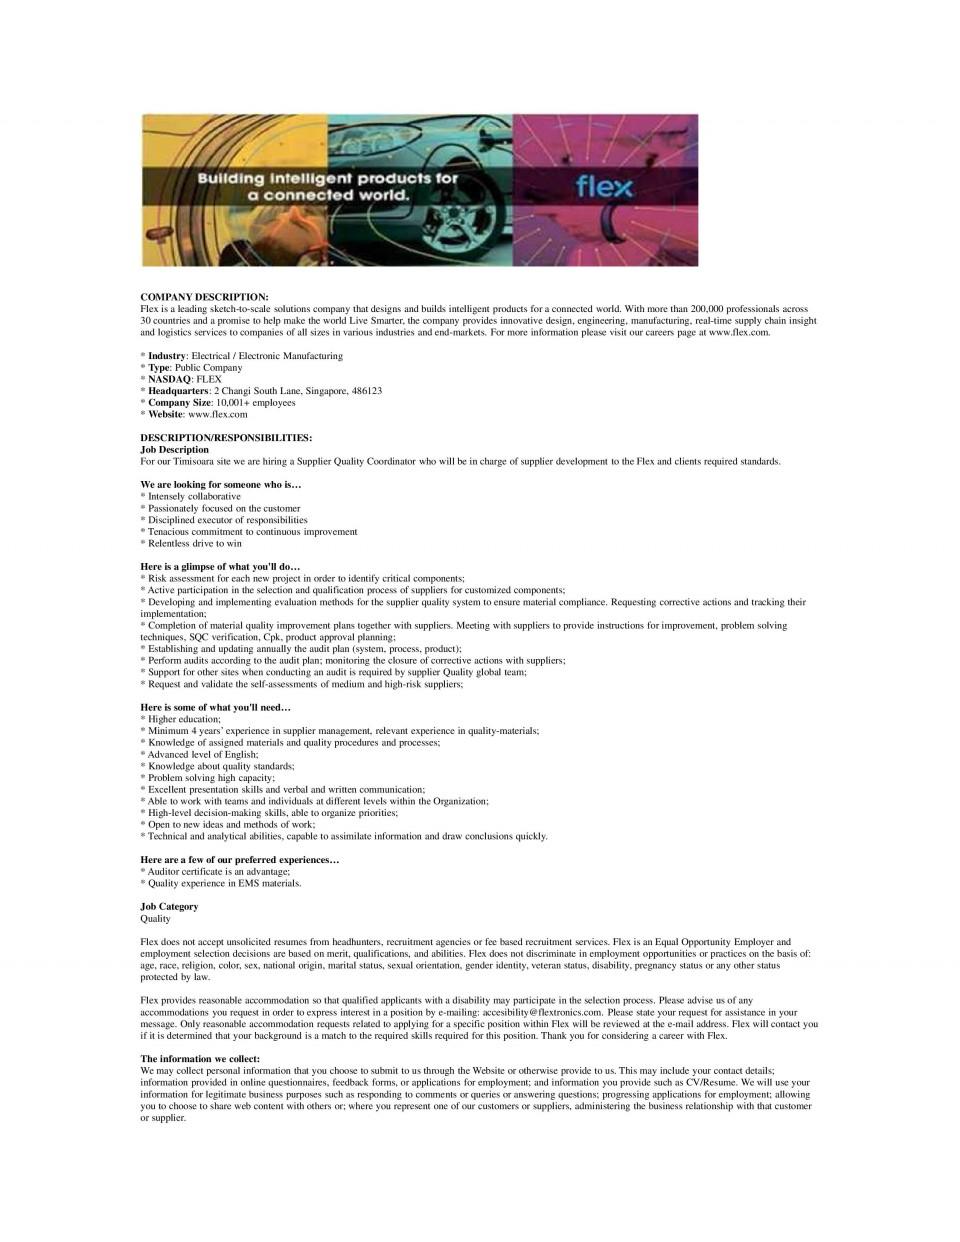 Supplier Quality Coordinator - WD036200